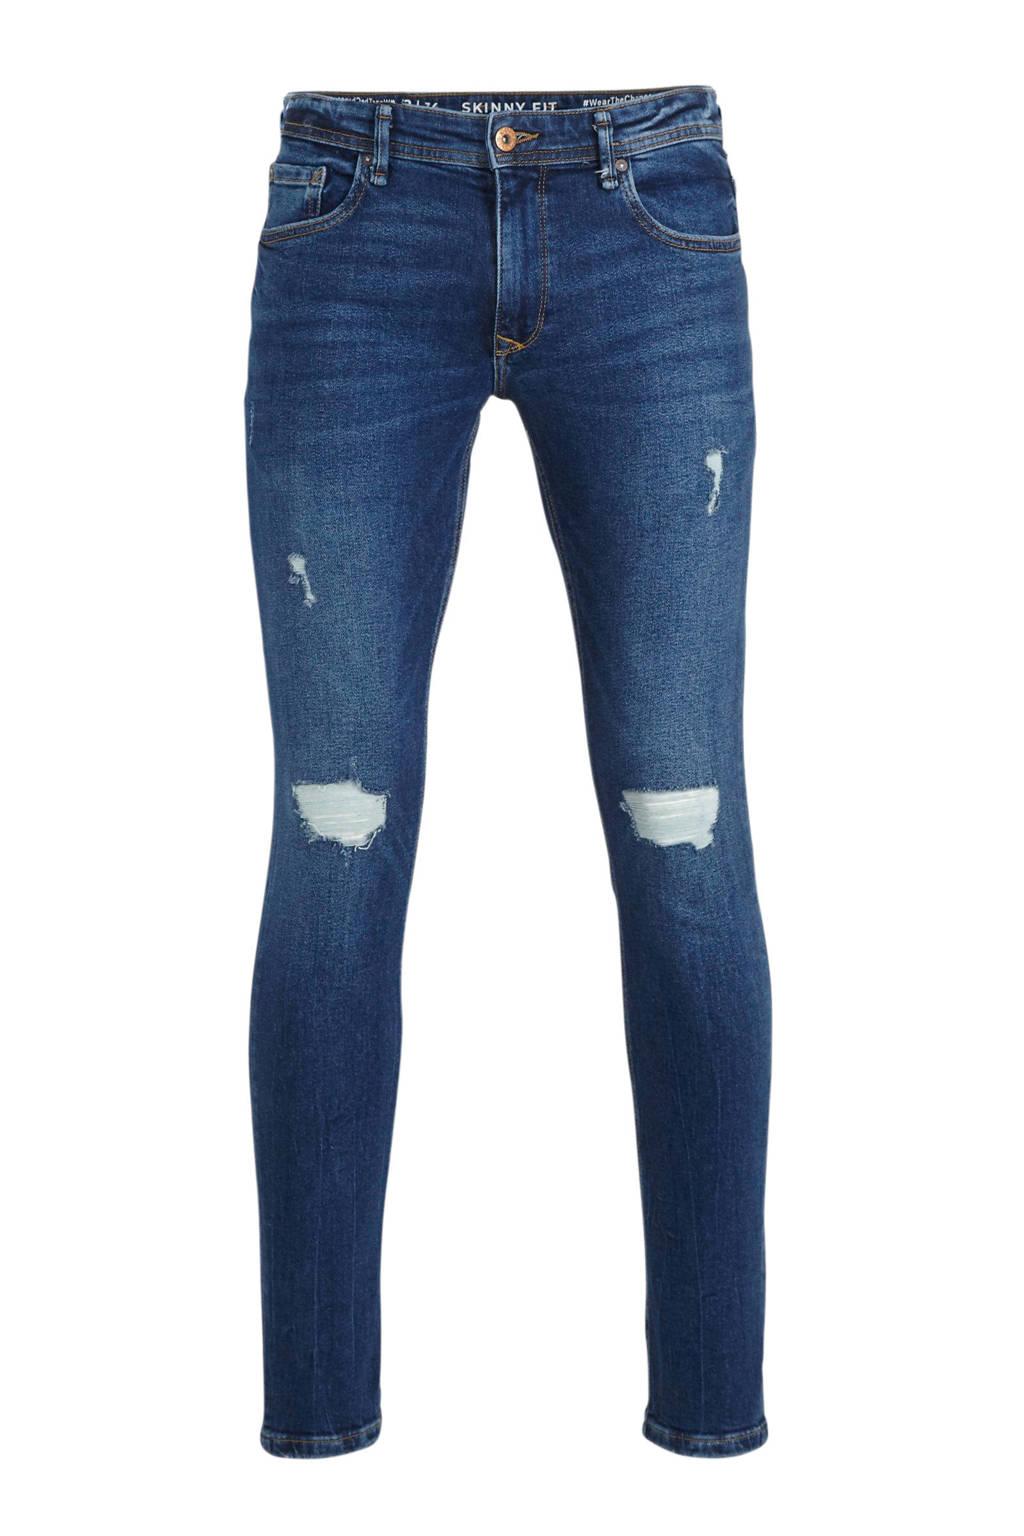 C&A Clockhouse slim fit jeans blauw, Blauw